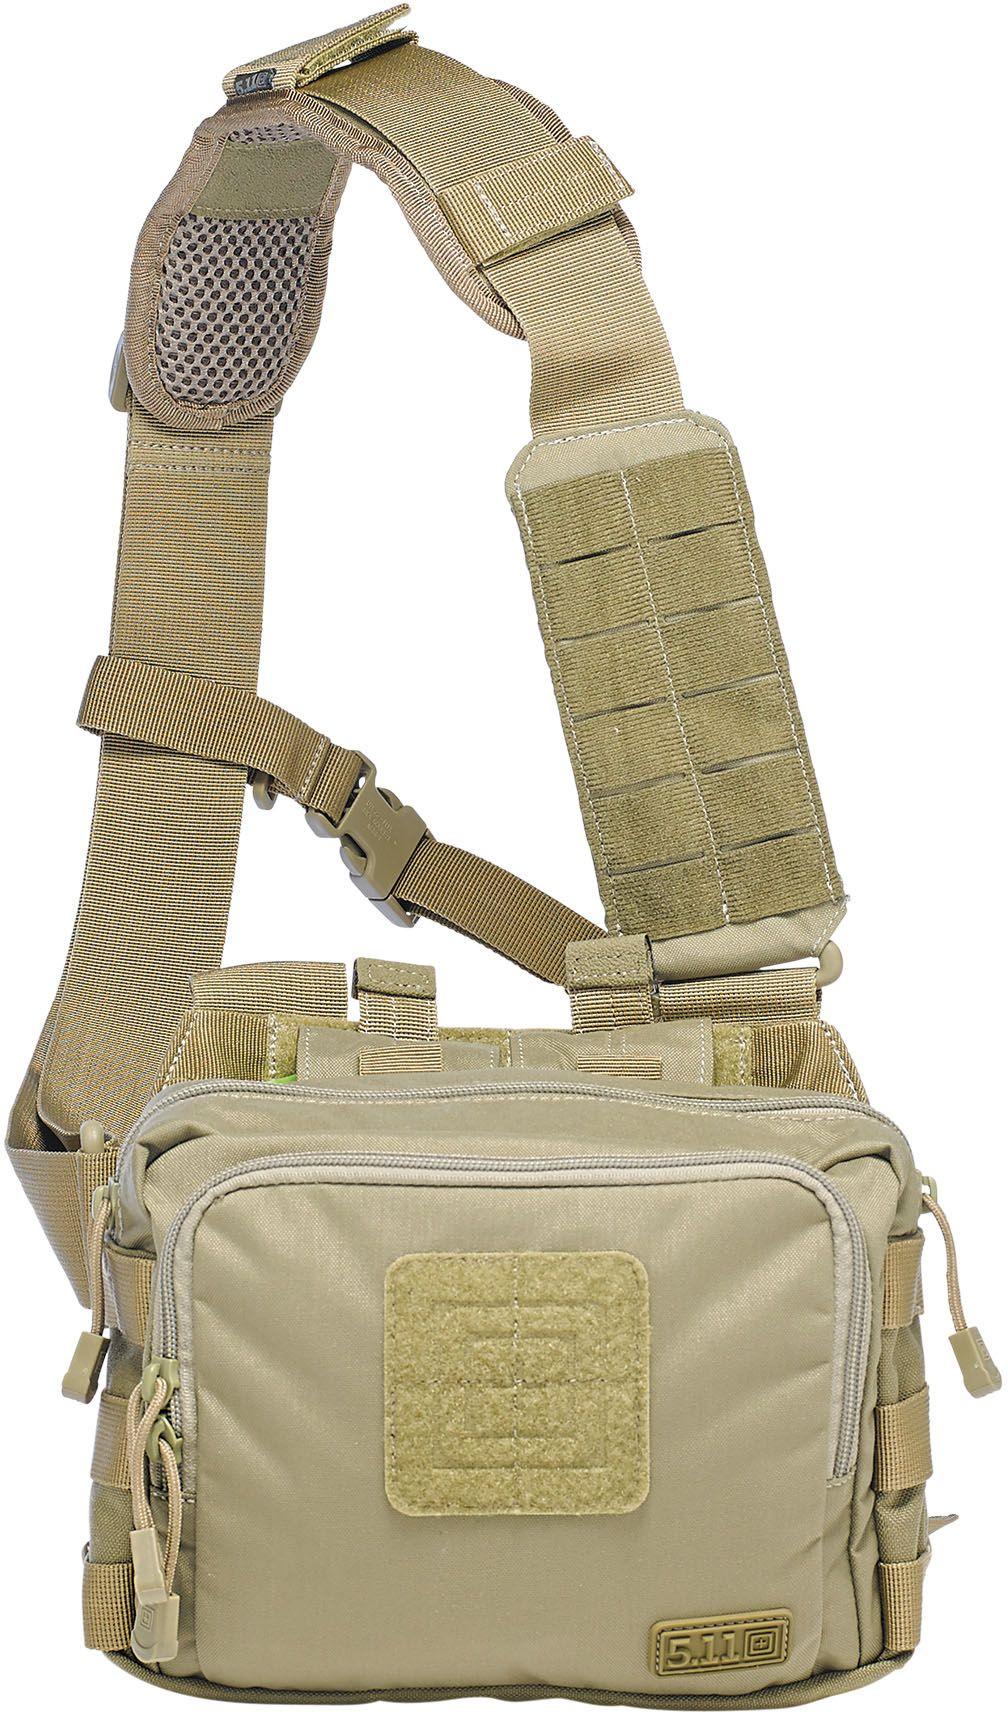 5.11 Tactical 2 Banger Gear Bag, No Size, Sand thumbnail